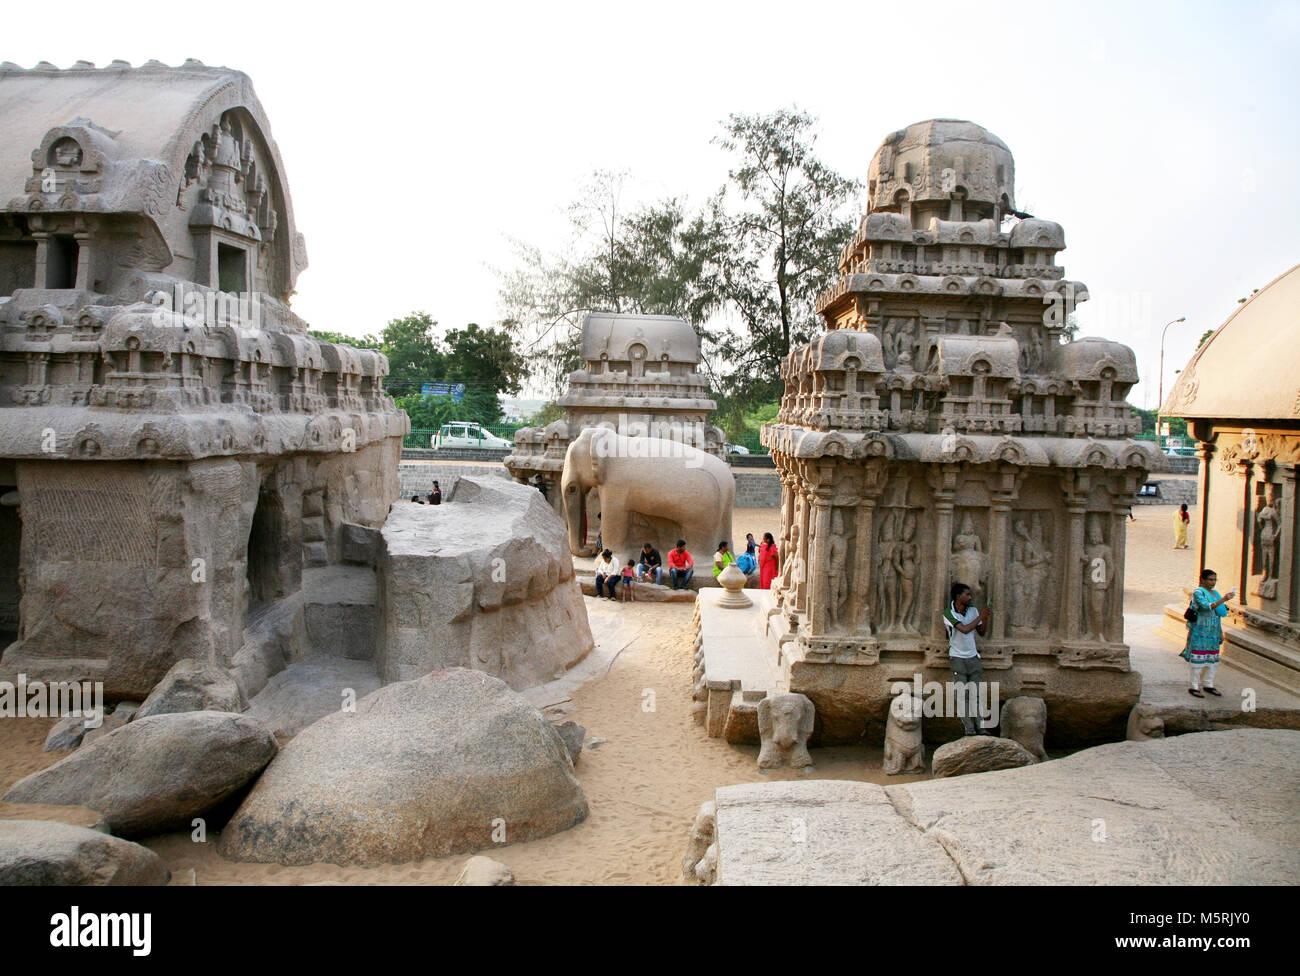 Arjuna Ratha, Mahabalipuram, India - Stock Image